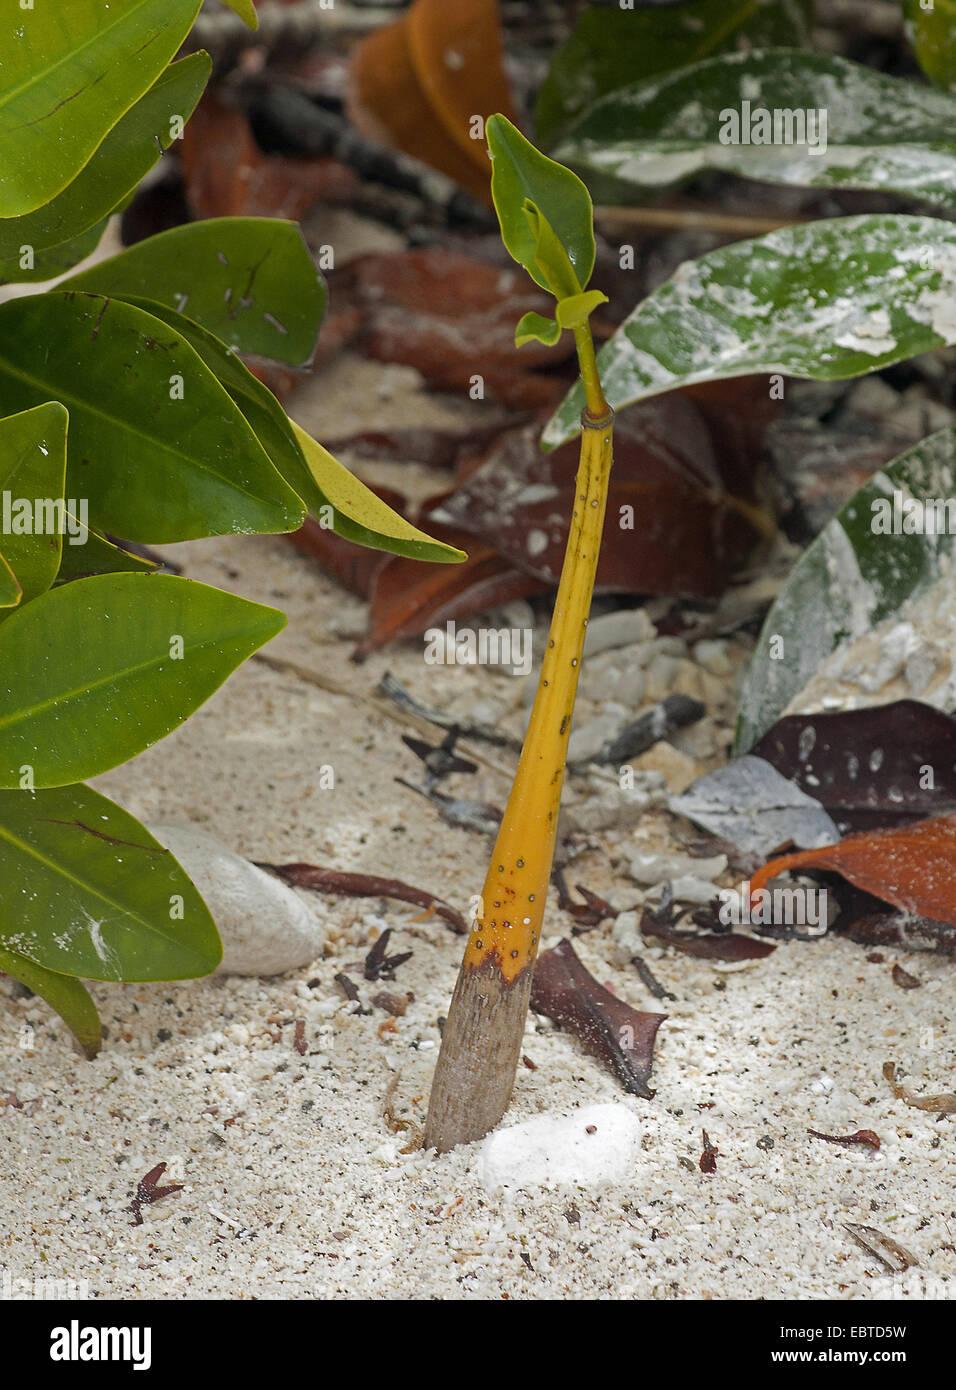 red mangrove (Rhizophora mangle), seedling in sand, Ecuador, Galapagos Islands, Genovesa - Stock Image